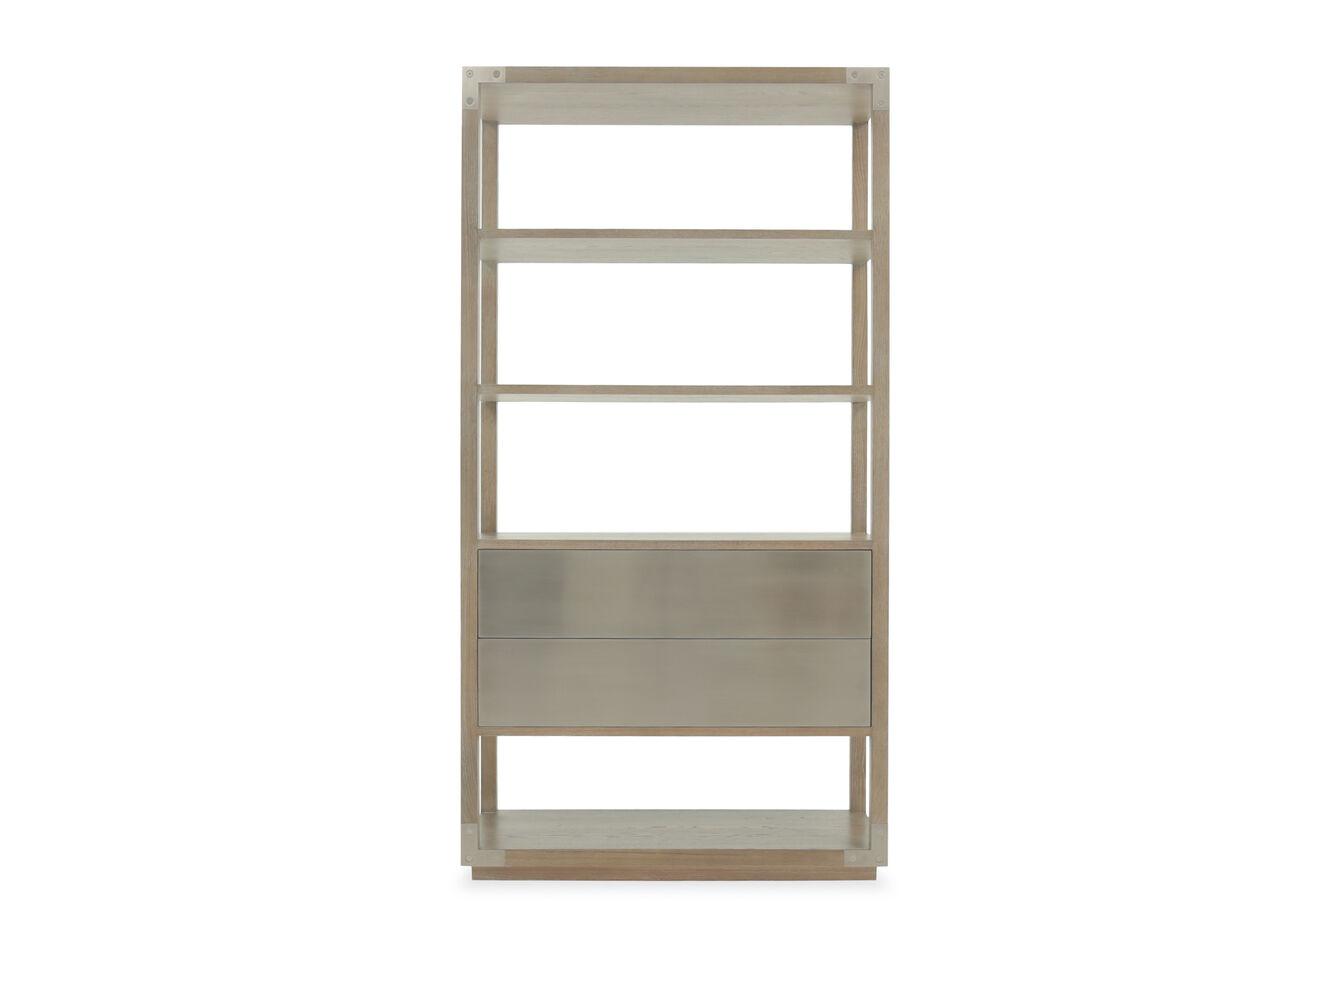 five shelf modern etagere in rustic sand mathis brothers furniture. Black Bedroom Furniture Sets. Home Design Ideas